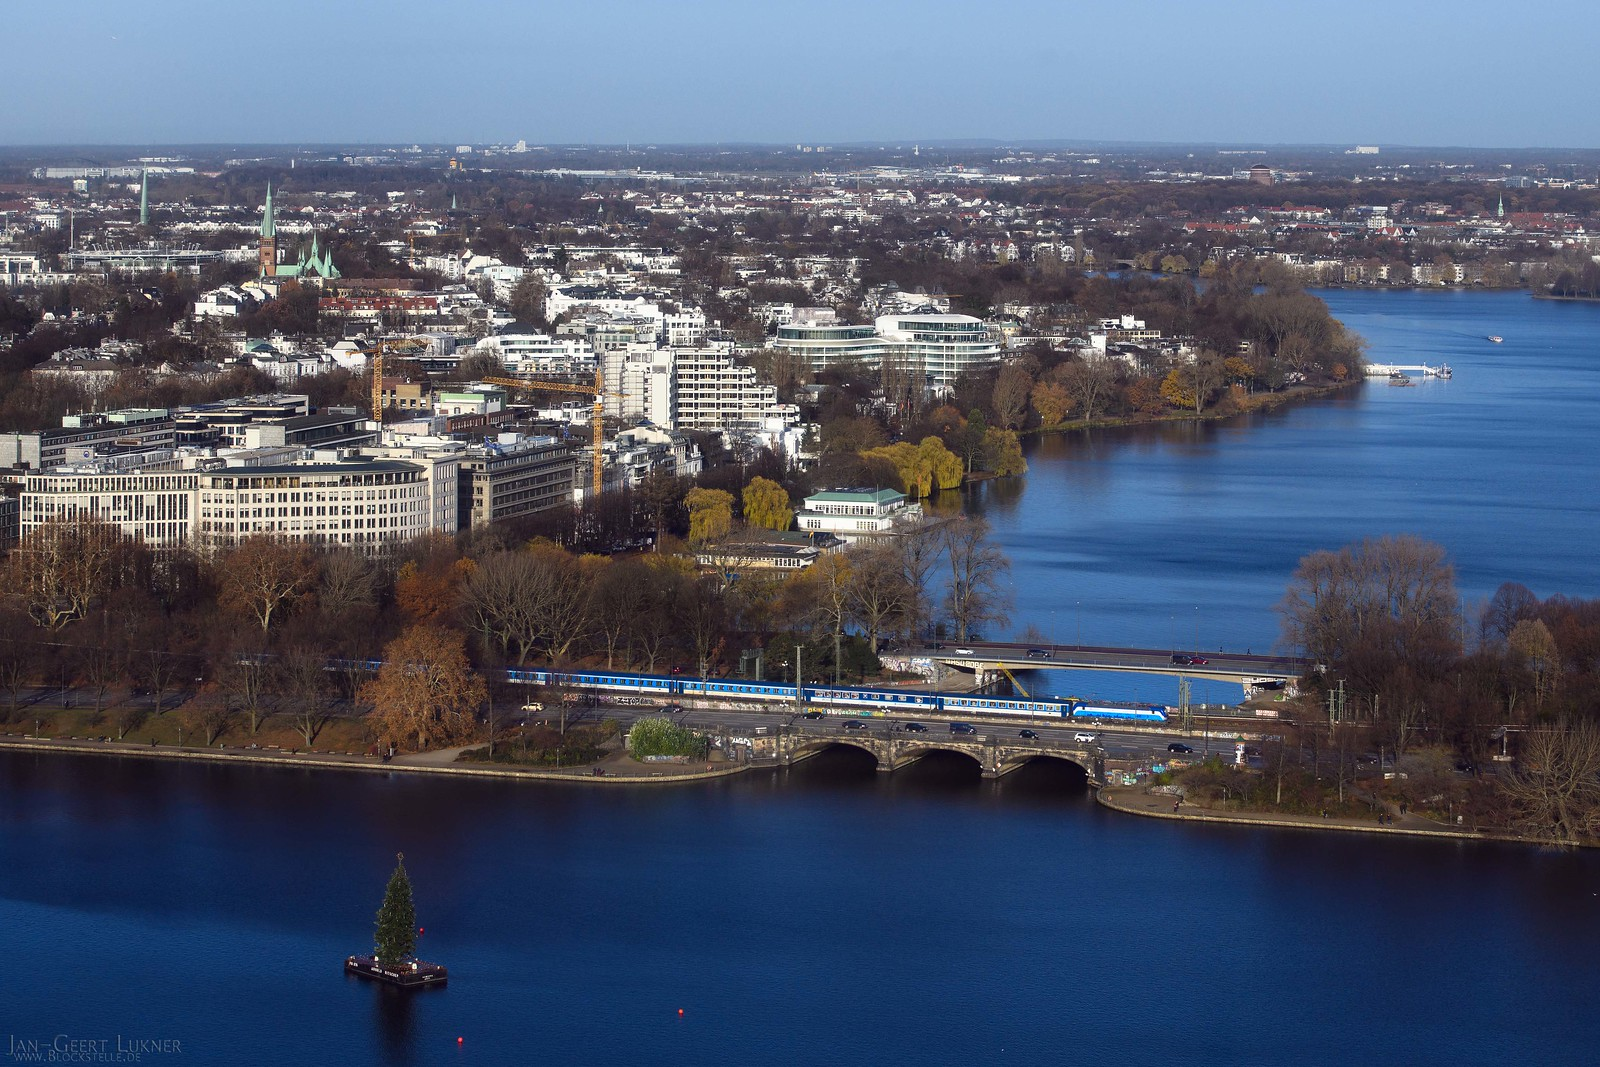 DE - Hamburg - View from St Petri tower